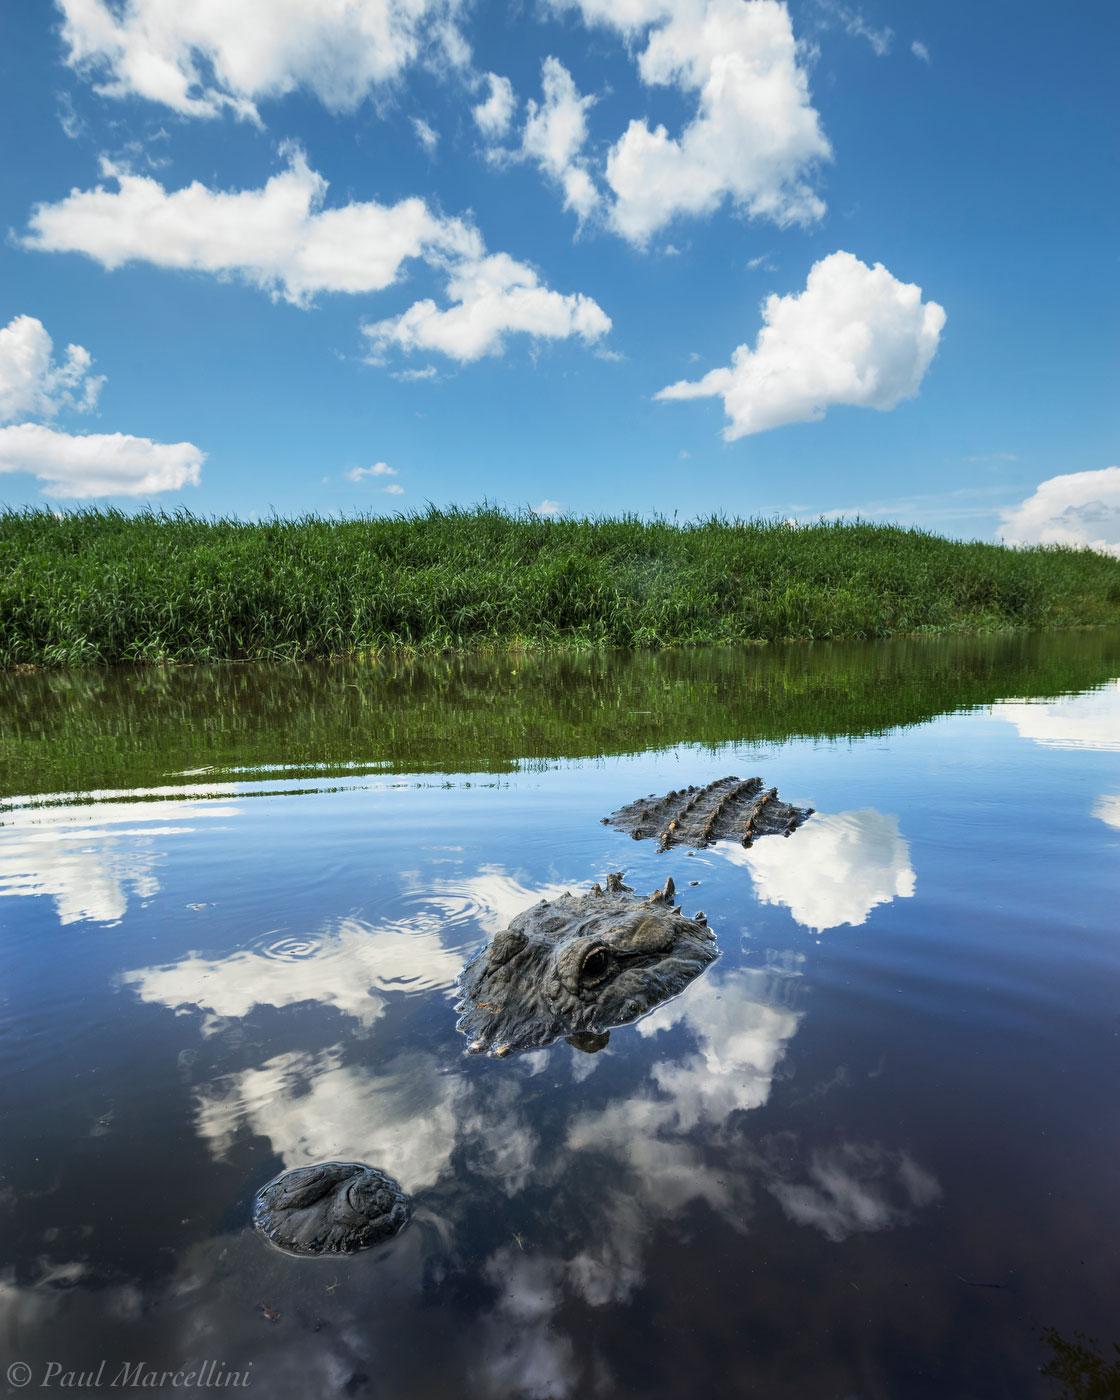 Myakka river state park, alligator, clouds, florida, photo